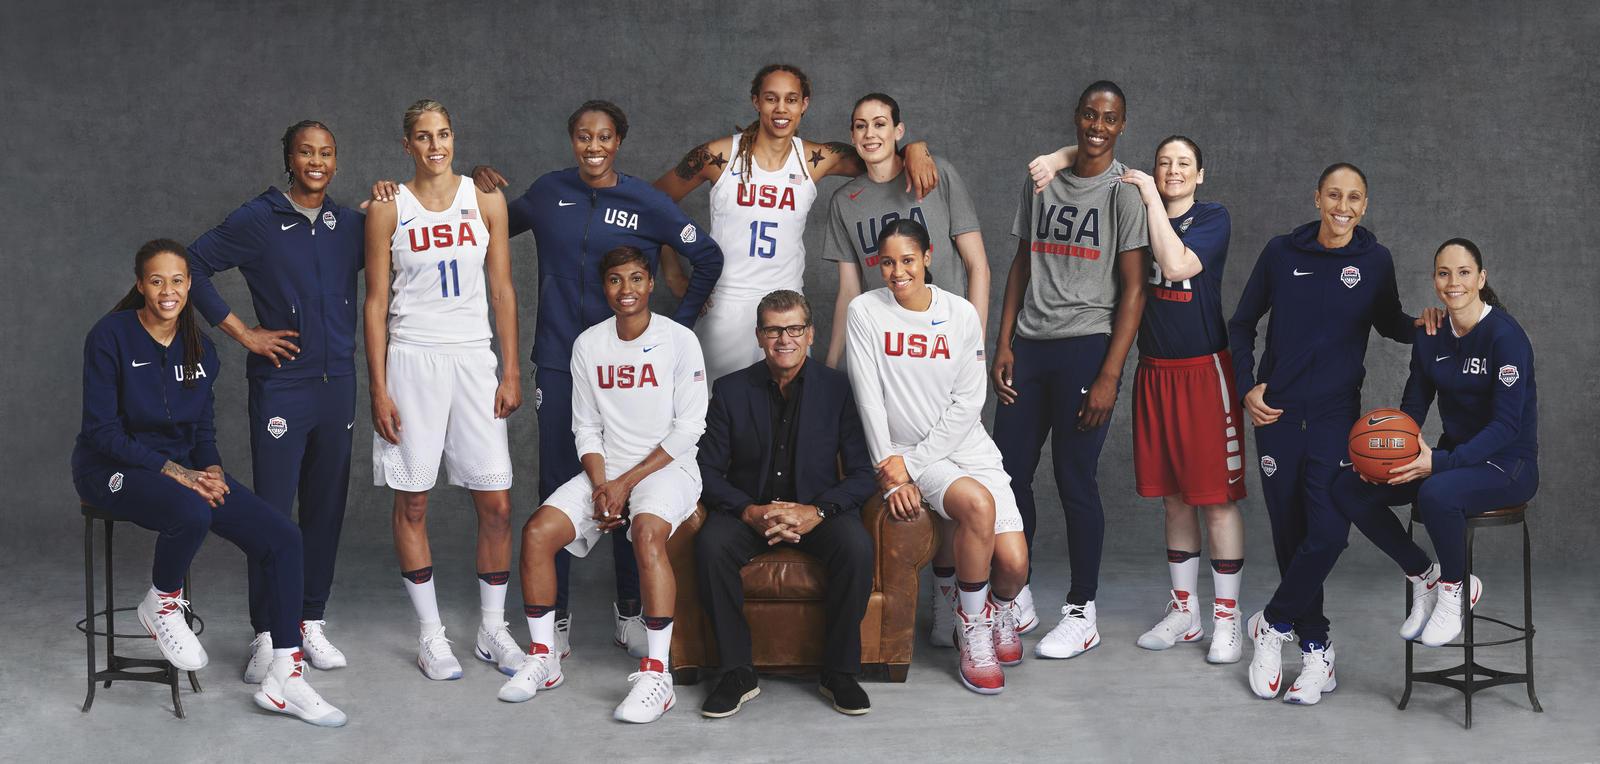 2016 USA Women's Basketball